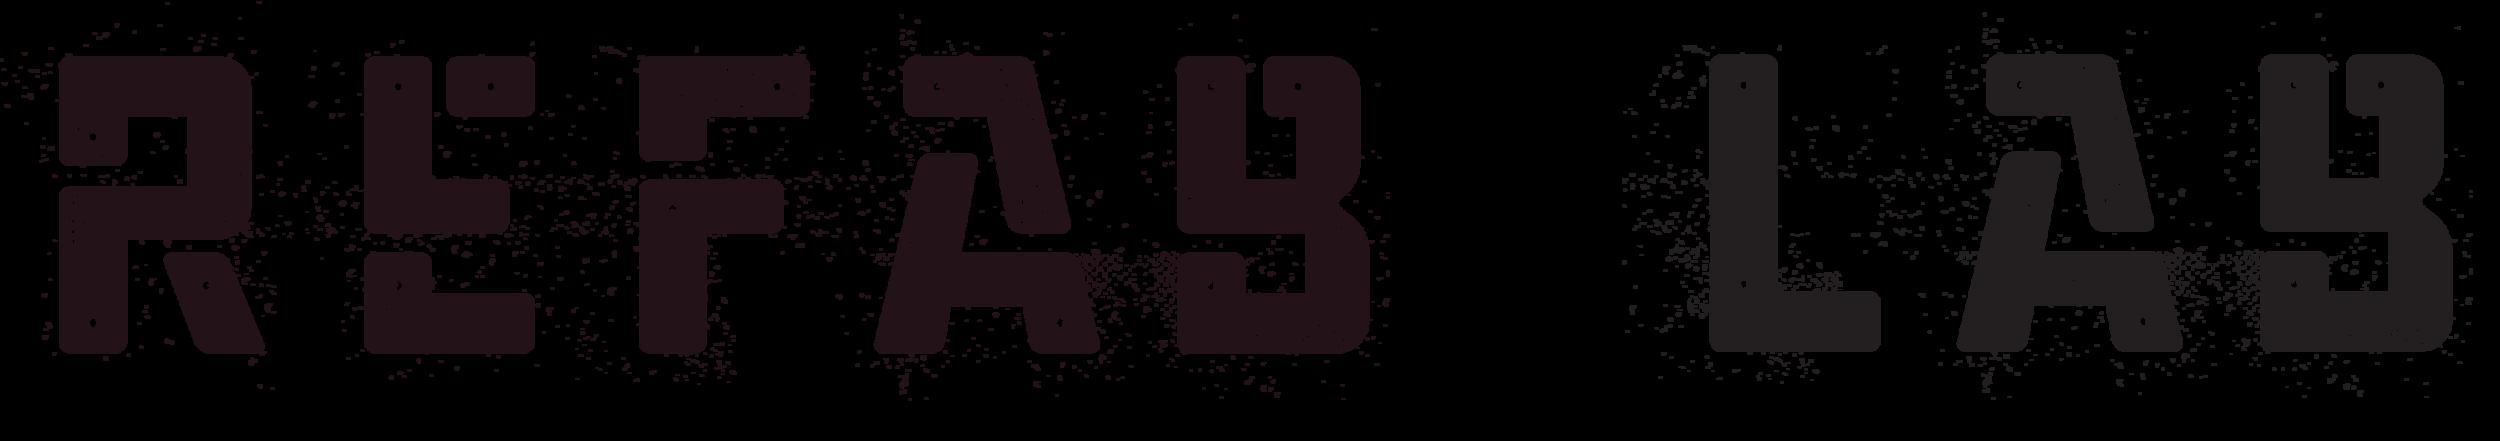 REFAB LAB logo.png